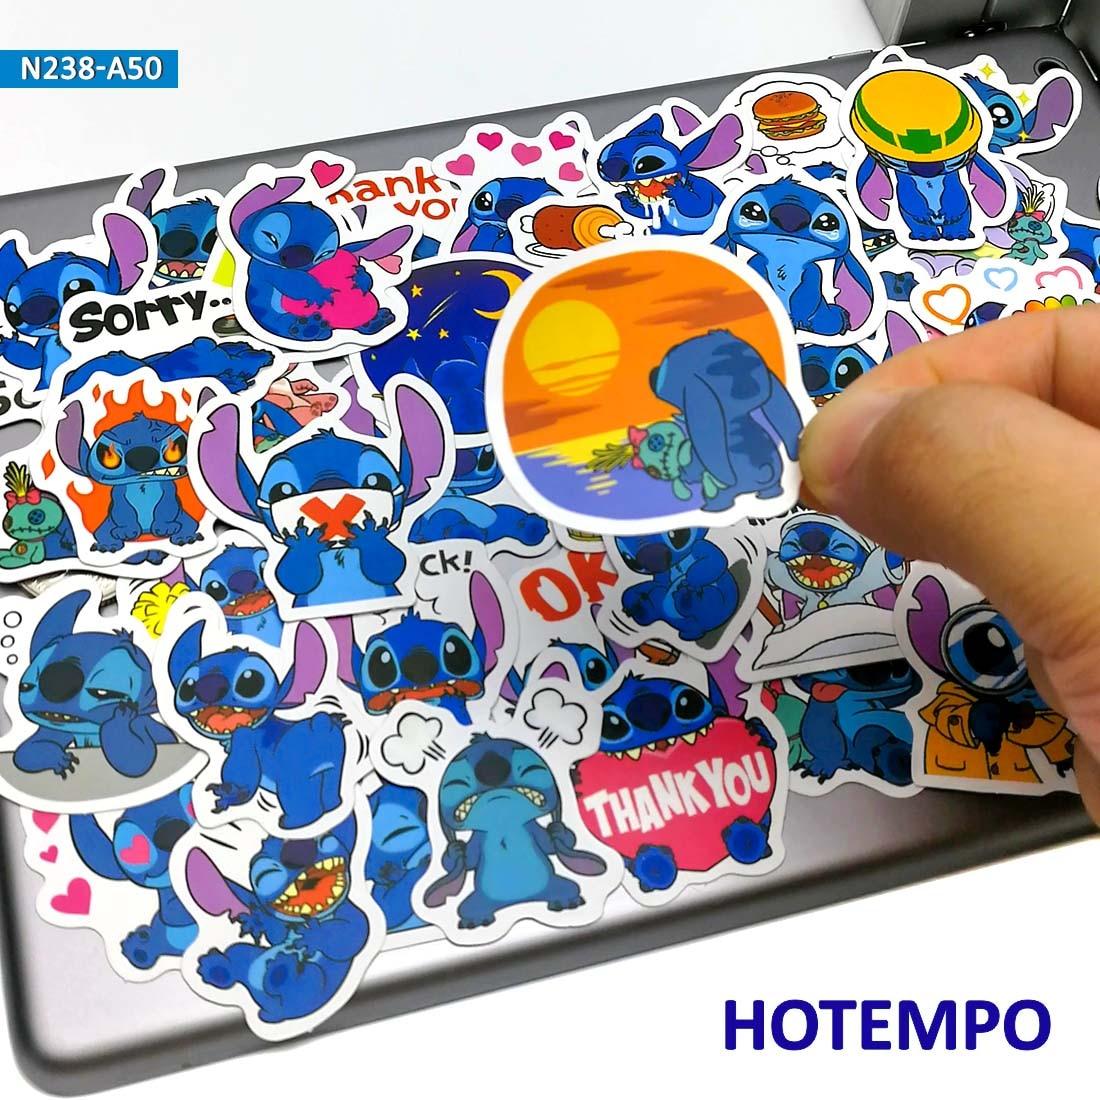 50pcs Cute Lilo Stitch Cartoon Stationery Anime Scrapbooking Stickers for Children Mobile Phone Laptop Guitar Skateboard Sticker(China)